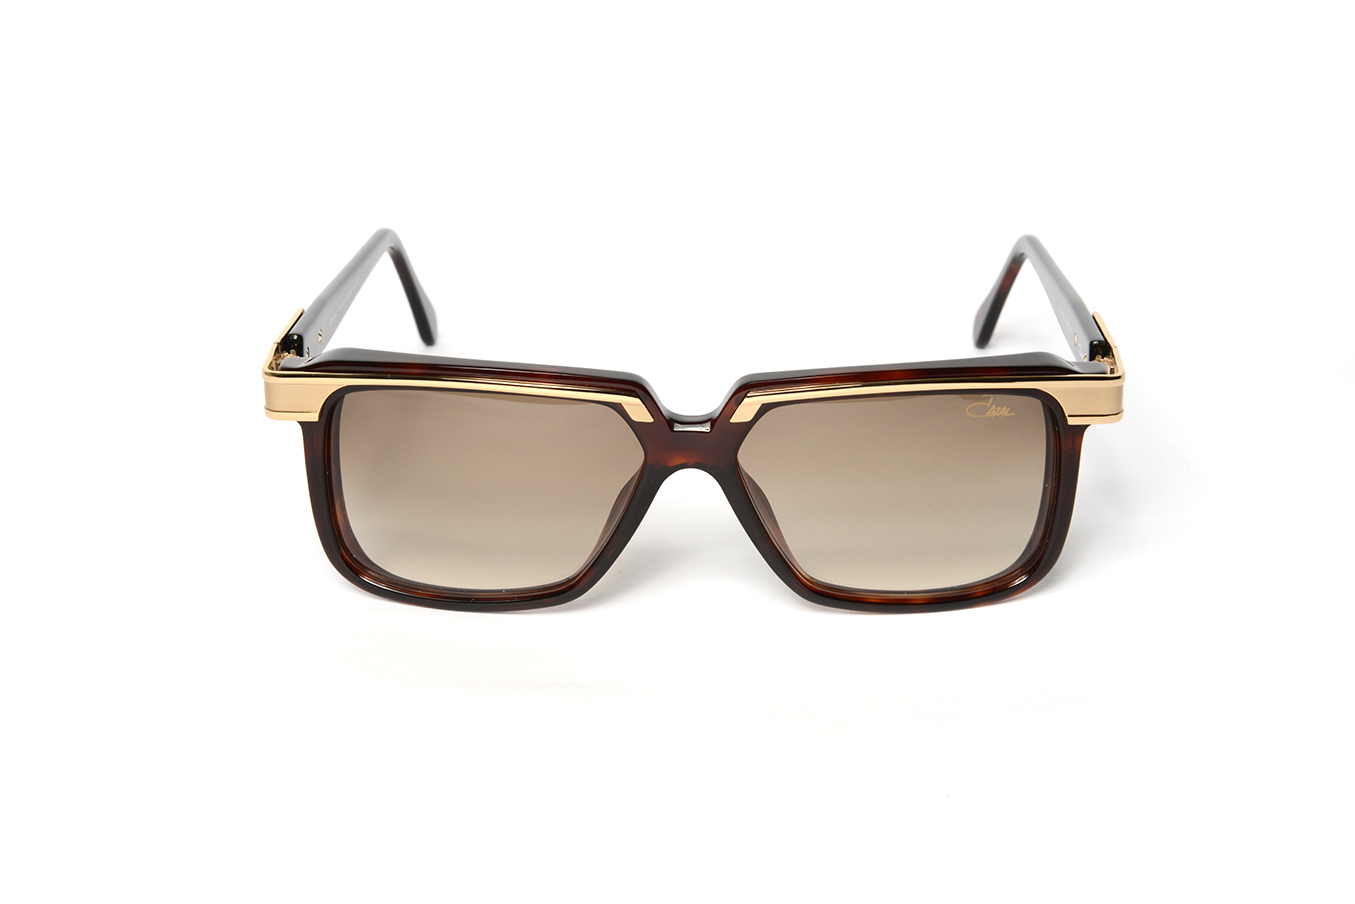 8458f4d1135 Cazal Eyewear 650 - Piccadilly Opticians -